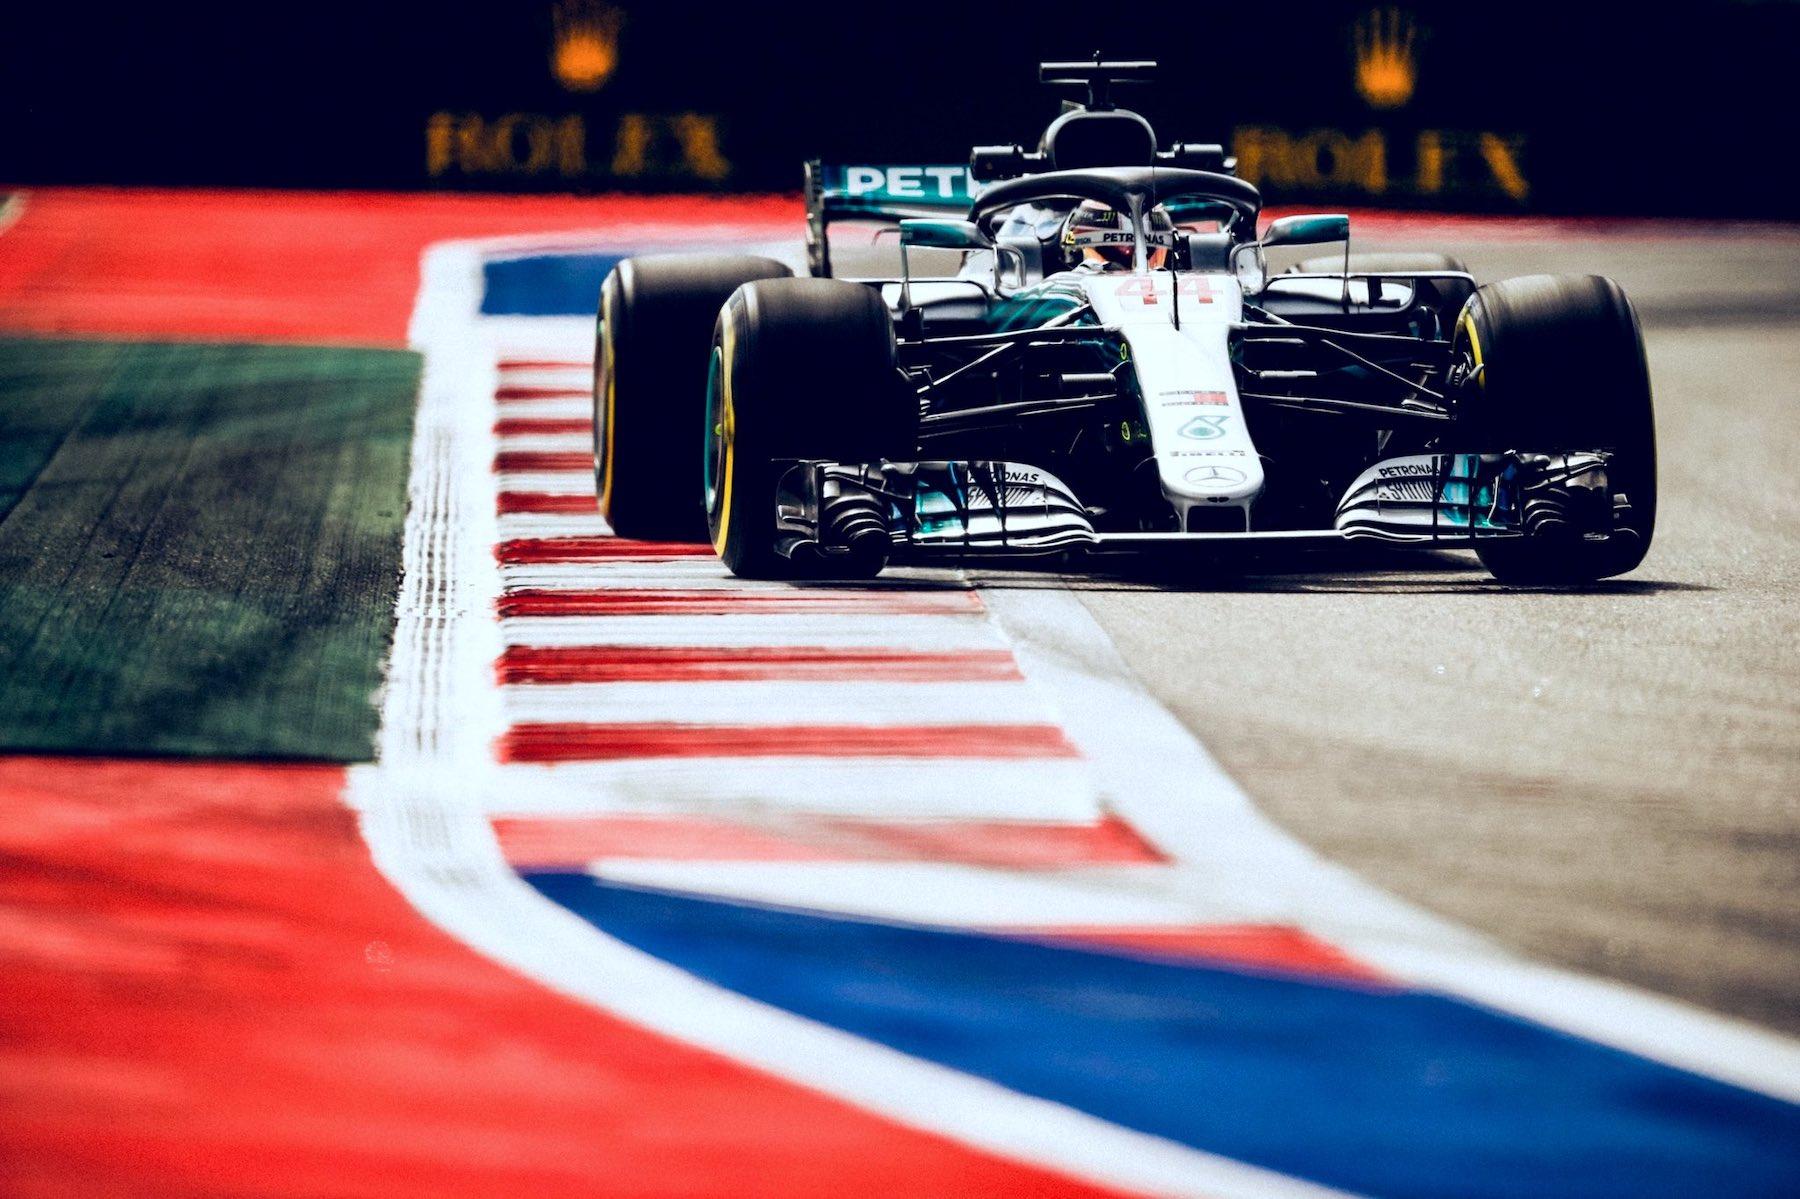 2018 Lewis Hamilton | Mercedes W09 | 2018 Russian GP FP3 2 copy.jpg